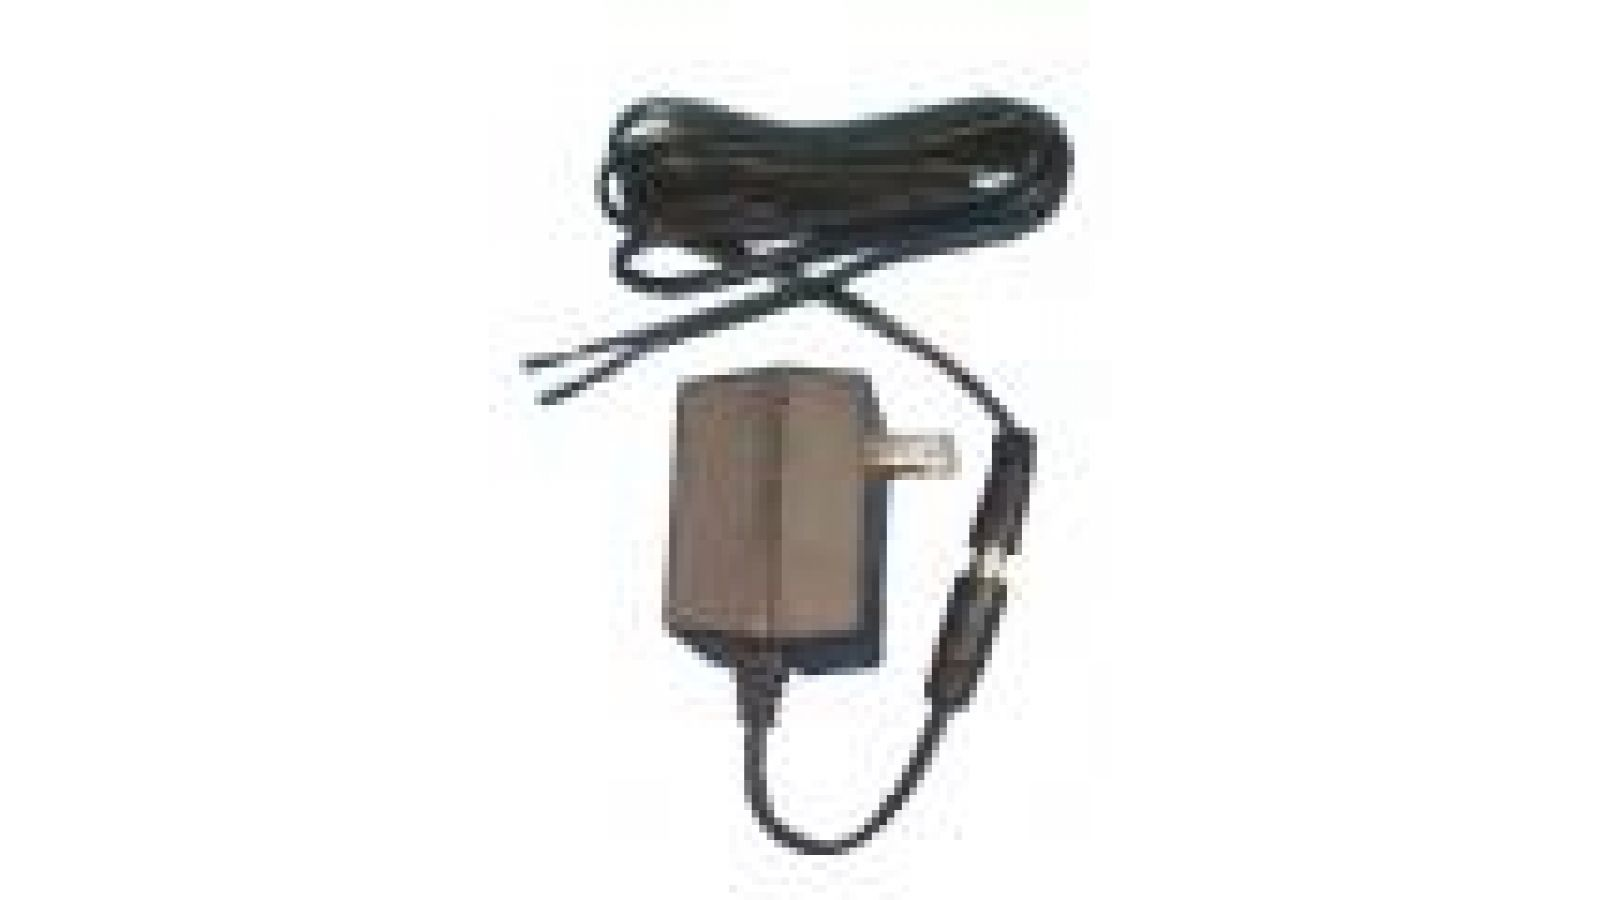 CV 90027 Class 2 Plug-in elecctronic Transformer